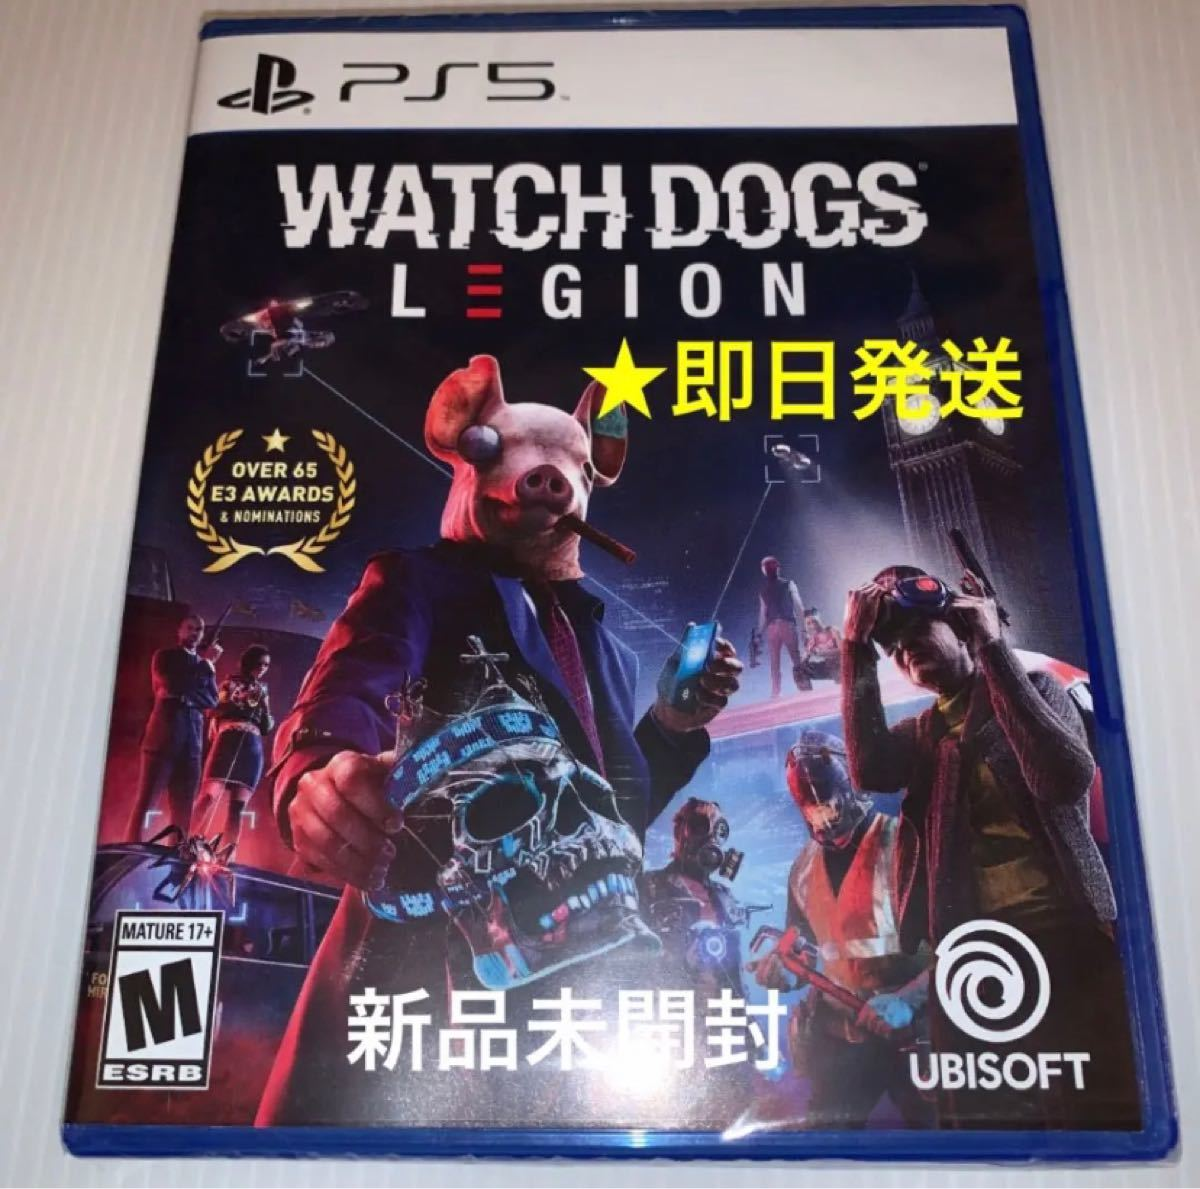 PS5 ウォッチドッグス レギオン Watch Dogs Legion新品未開封